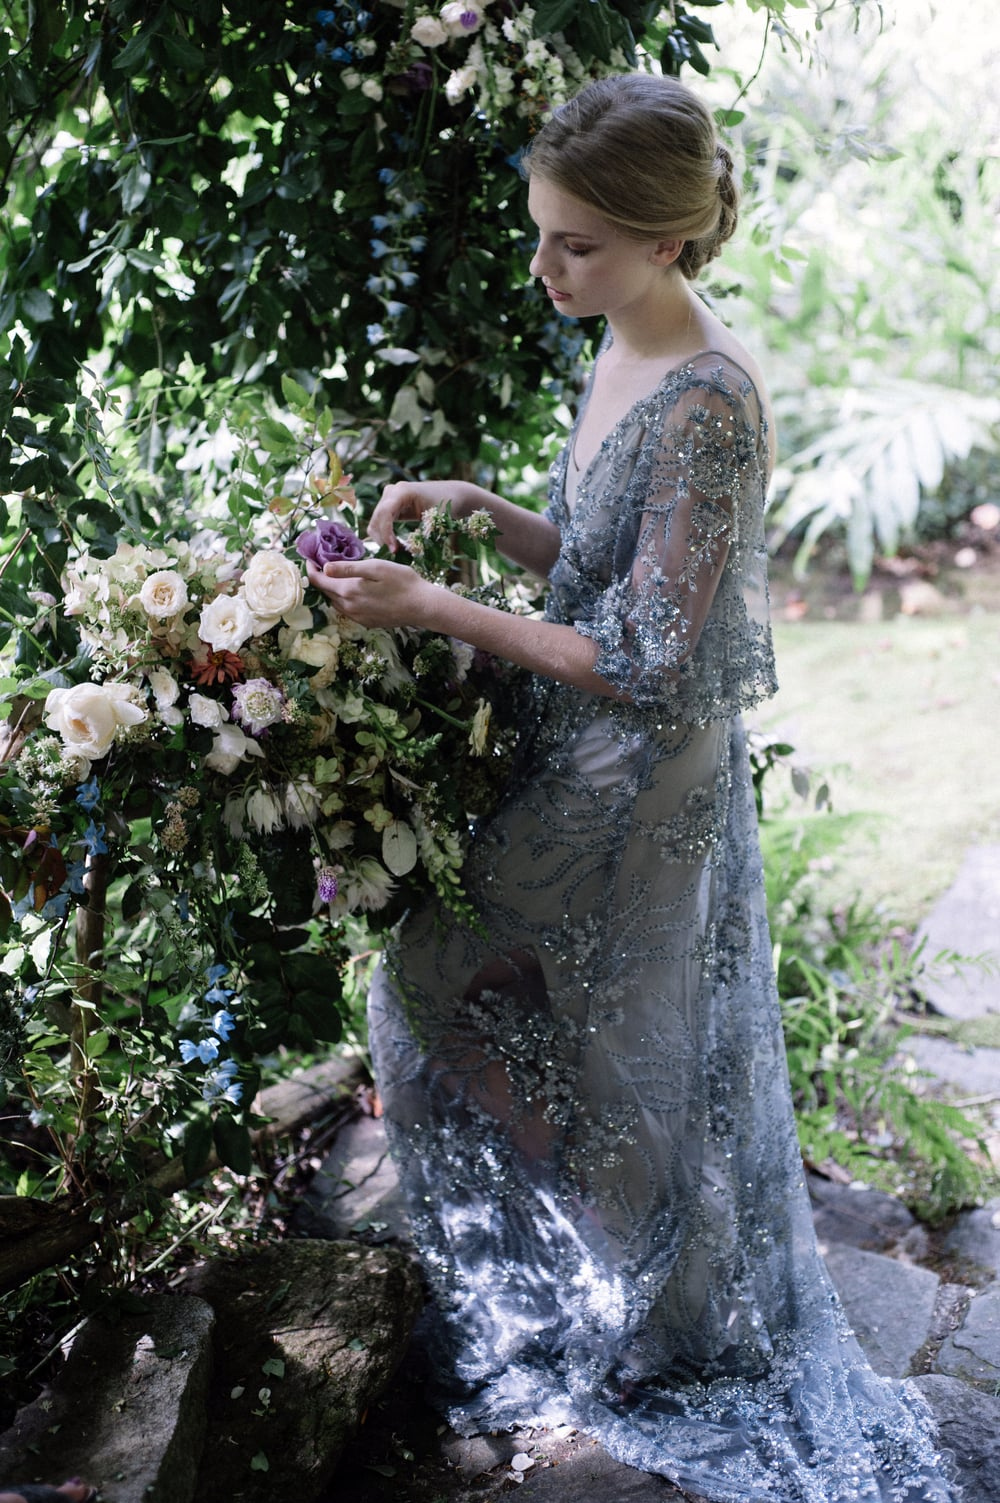 amy-osaba-events-flower-workshop-katie-hyatt-blue-dress-pink-flowers-bouquet50.jpg